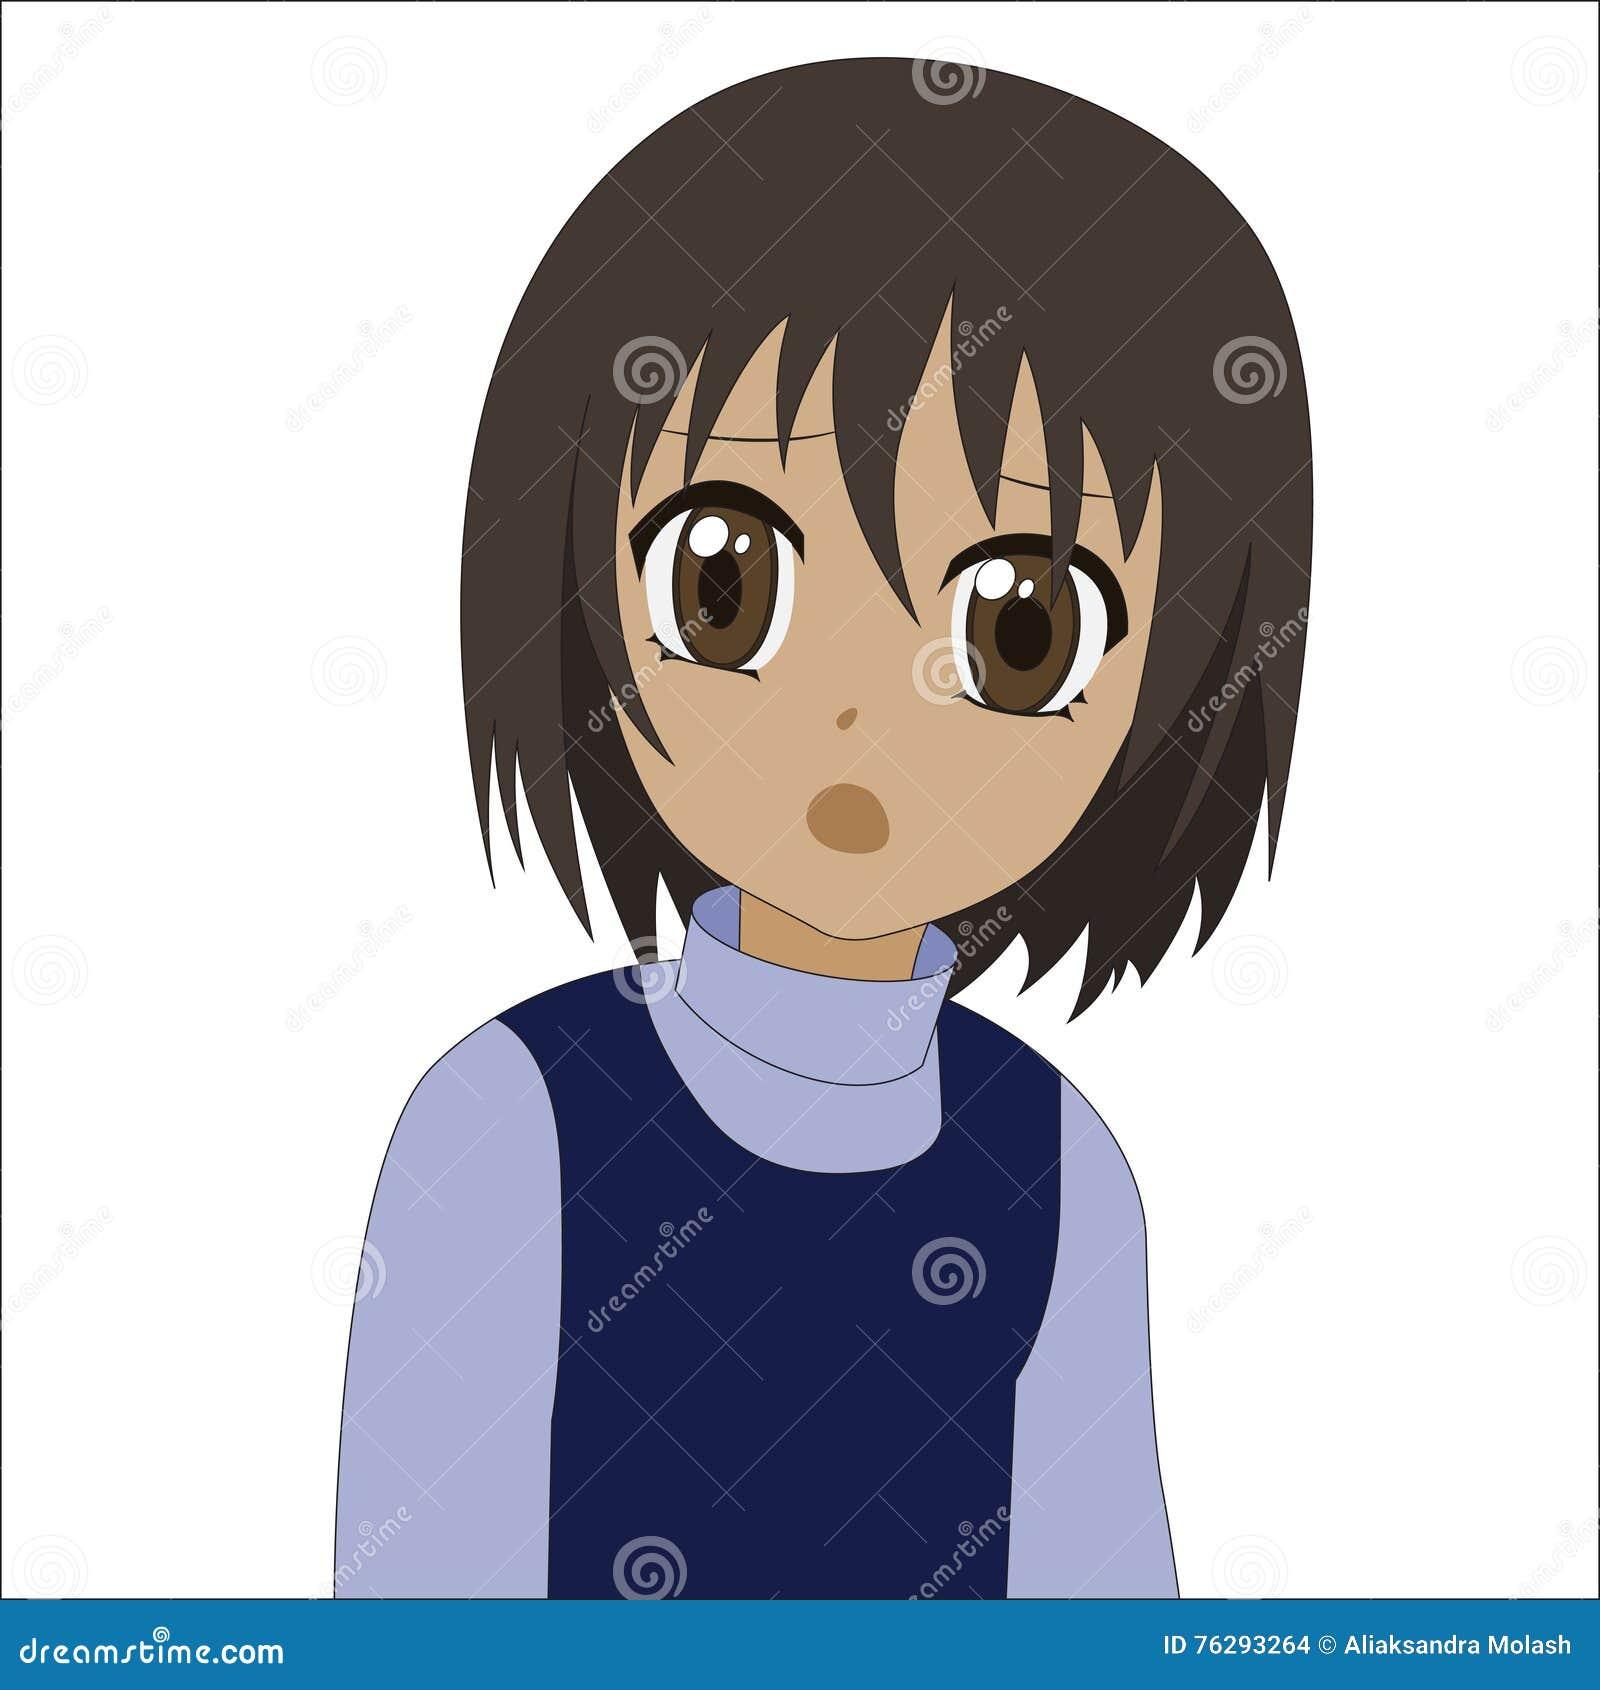 kleines m dchen netten karikatur anime vektor abbildung